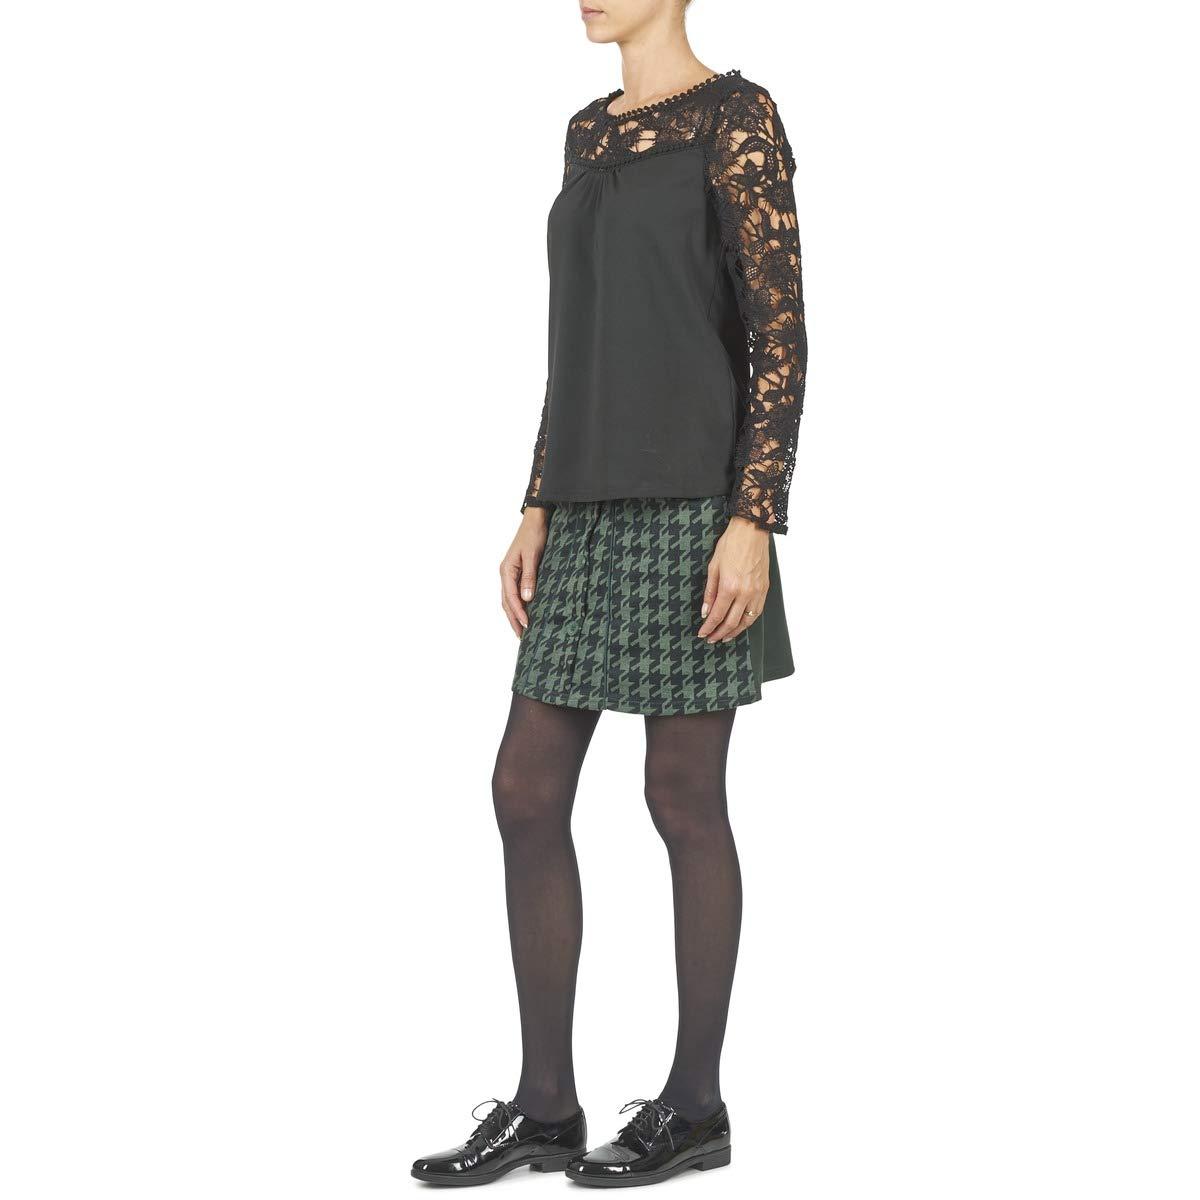 Smash  damen BORIA Grün Röcke B01KVQA070 Röcke Bequeme Berührung Berührung Berührung 1f5e80